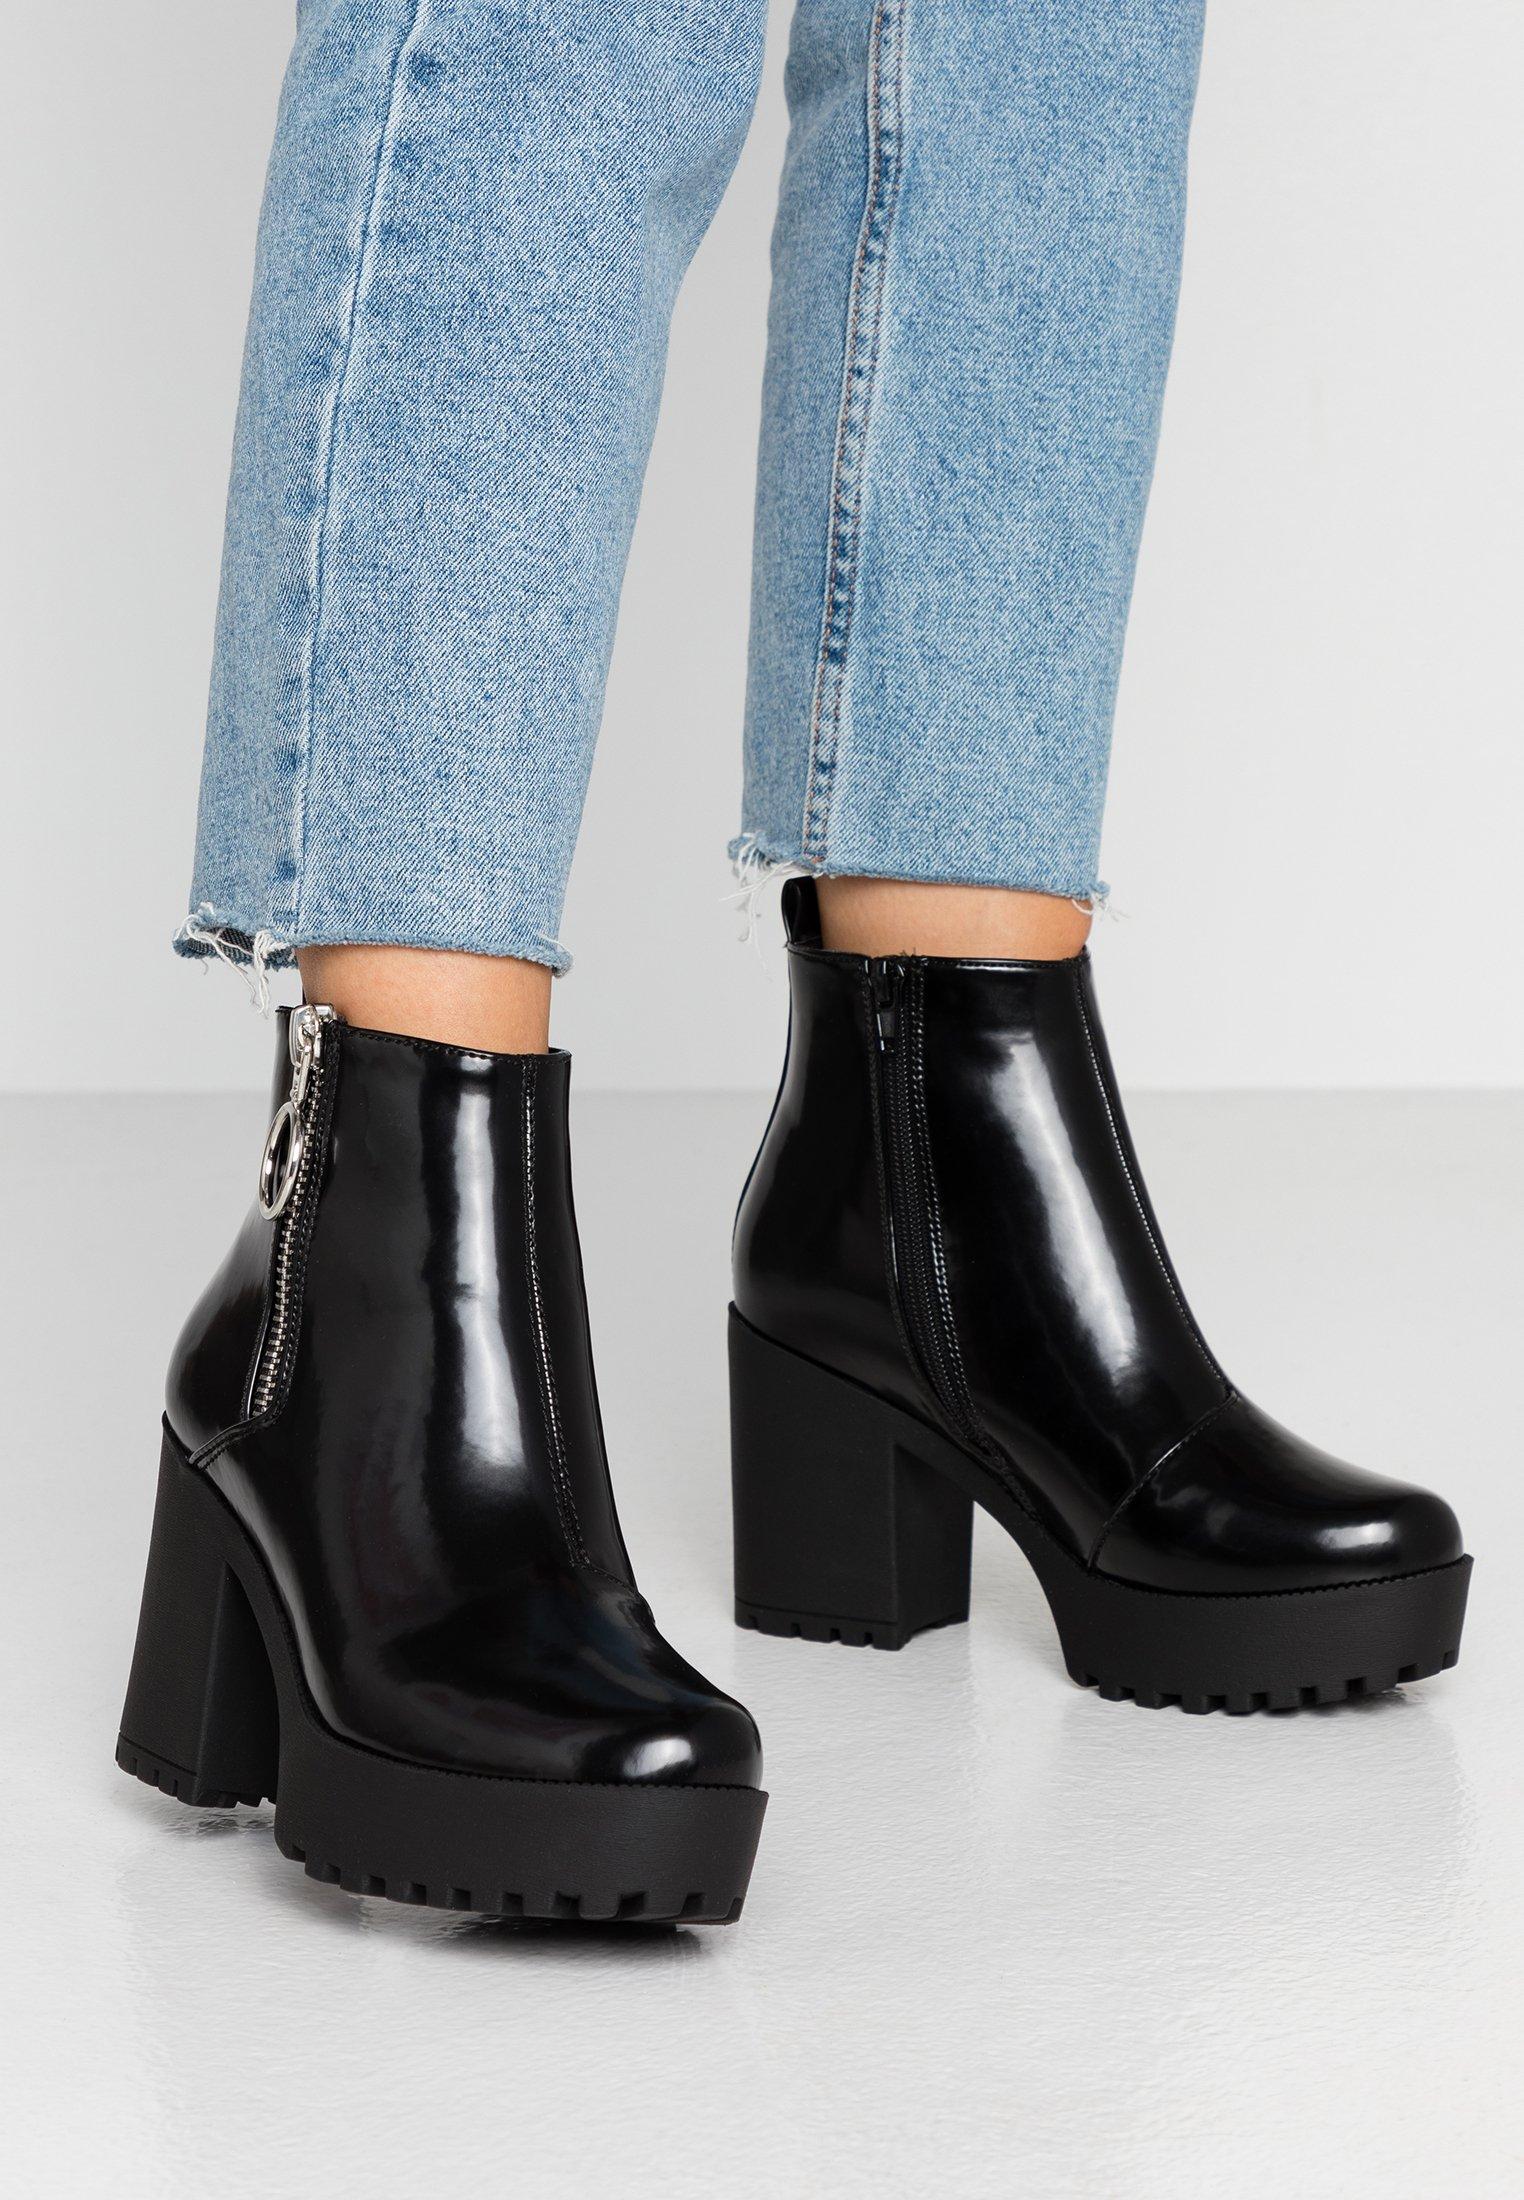 zapatos geox baratos online forever 21 negro